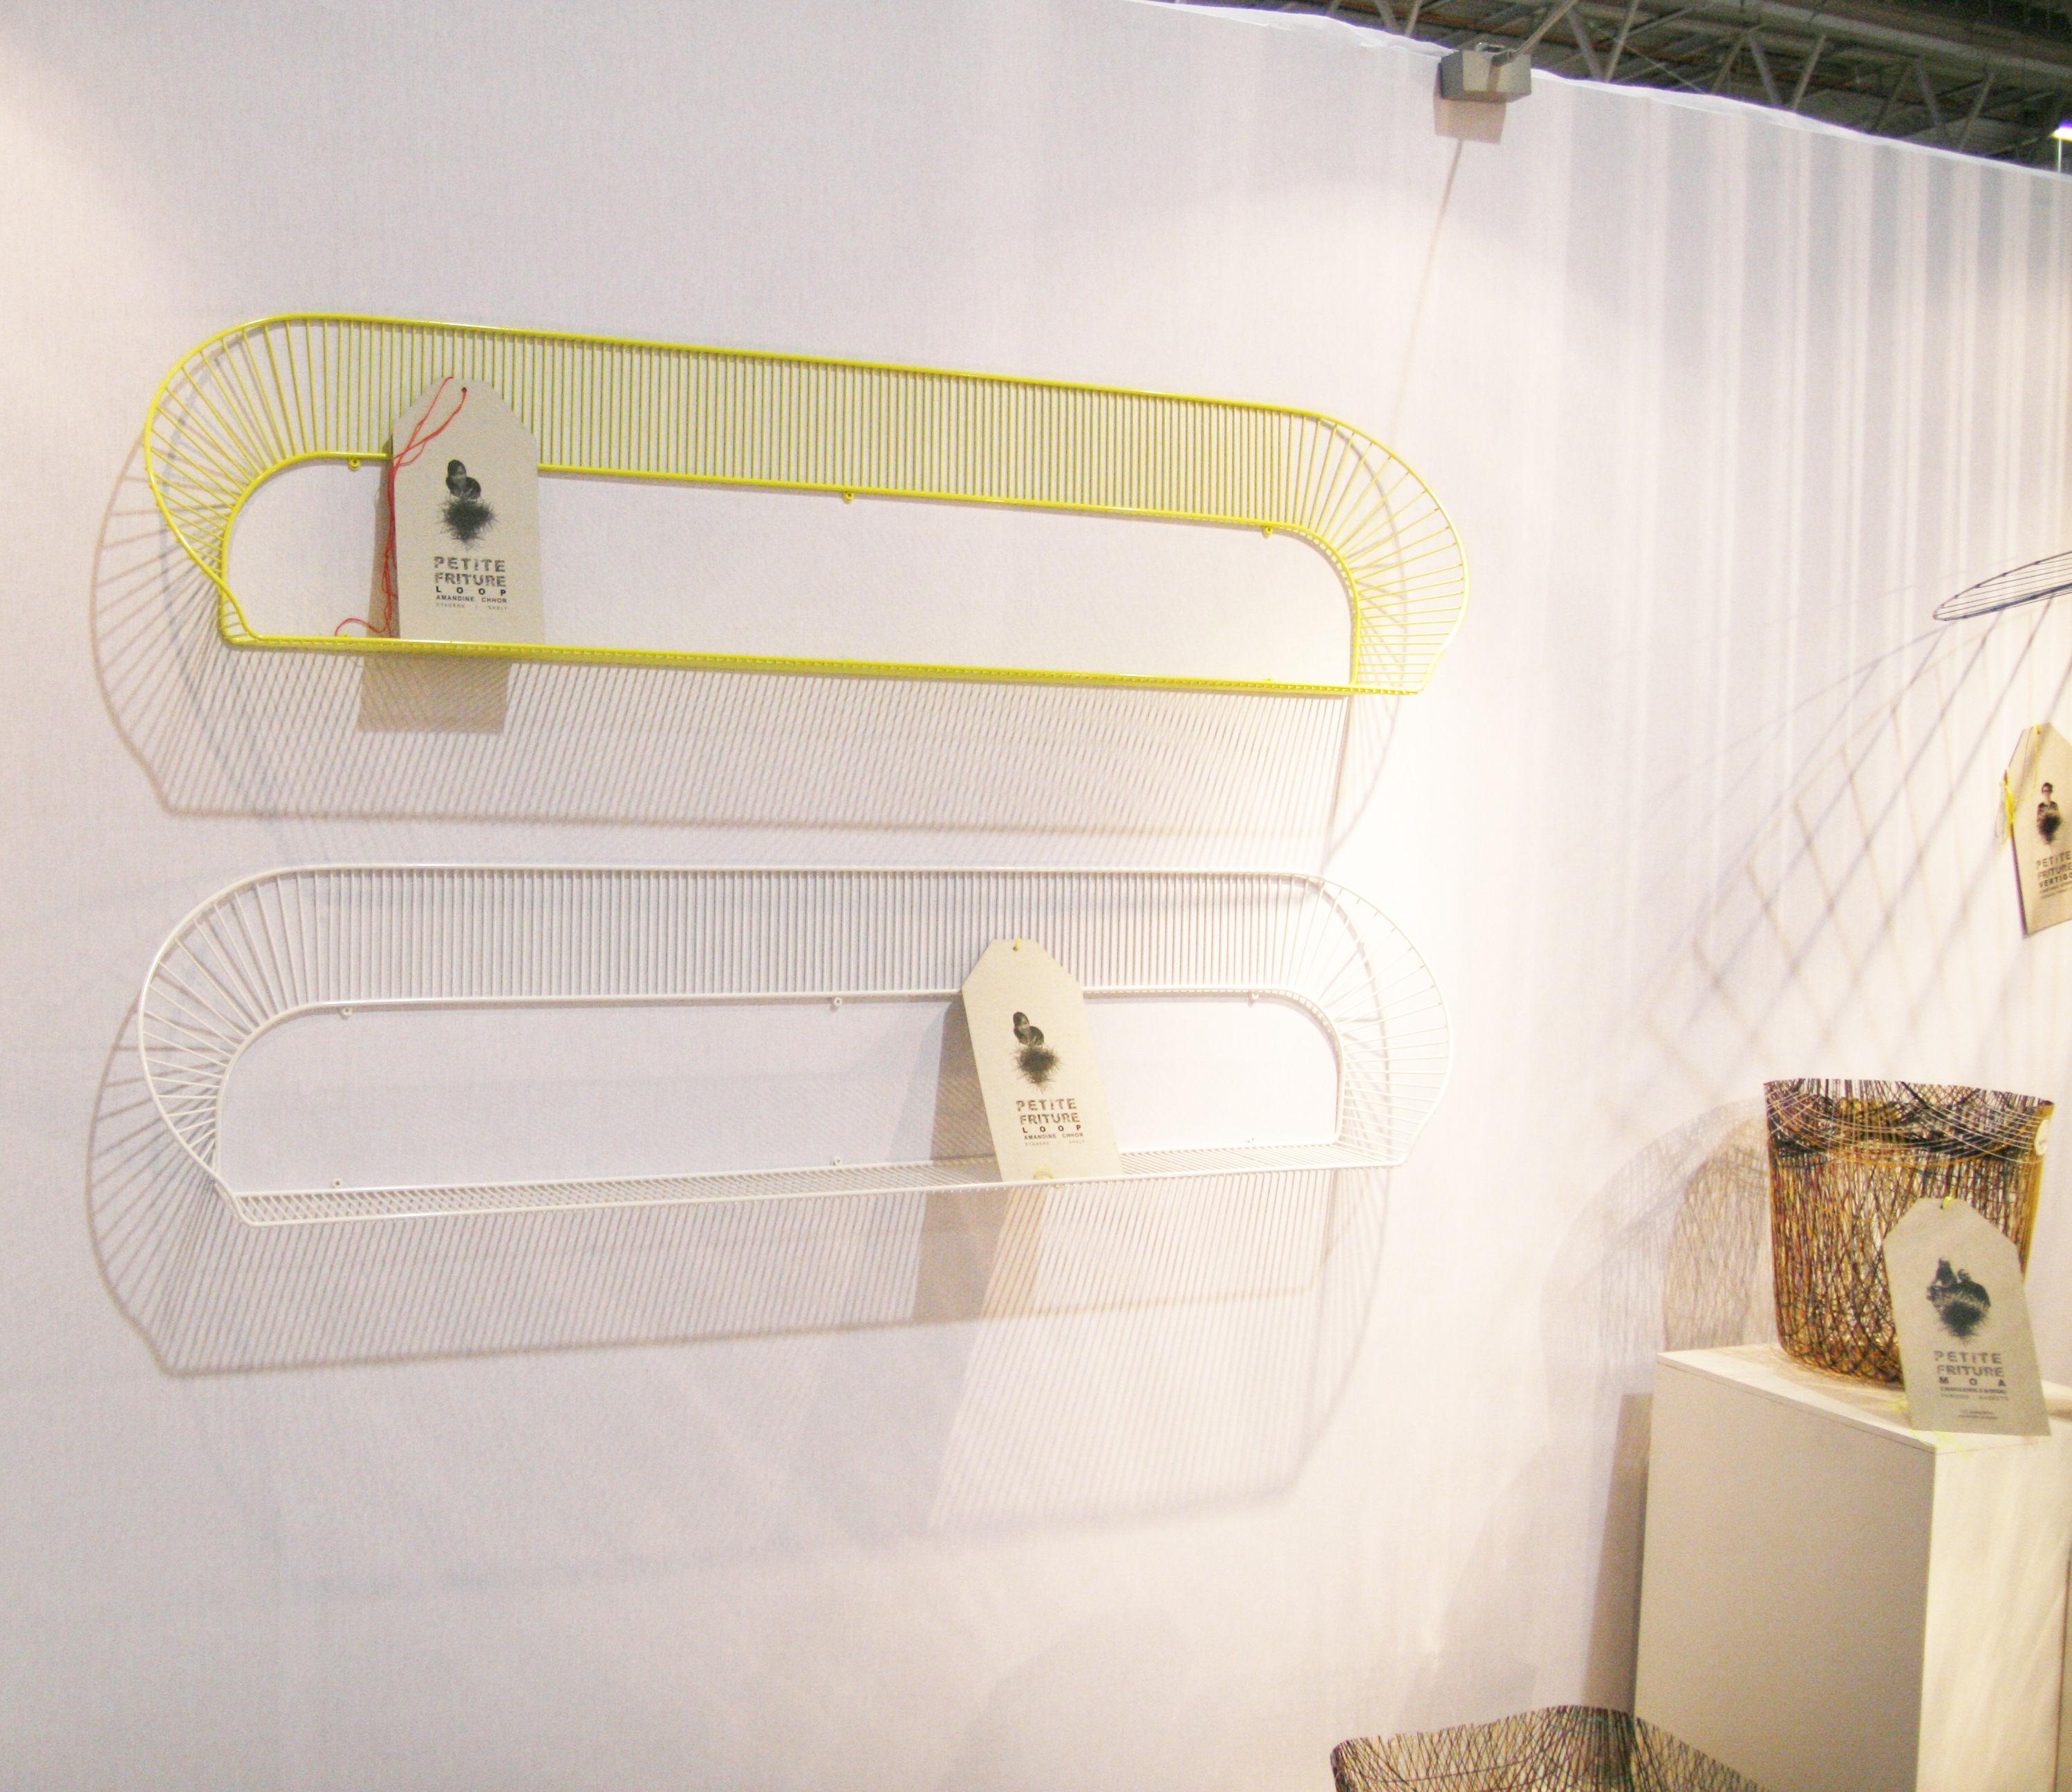 etag re loop l 158 cm jaune citron petite friture. Black Bedroom Furniture Sets. Home Design Ideas